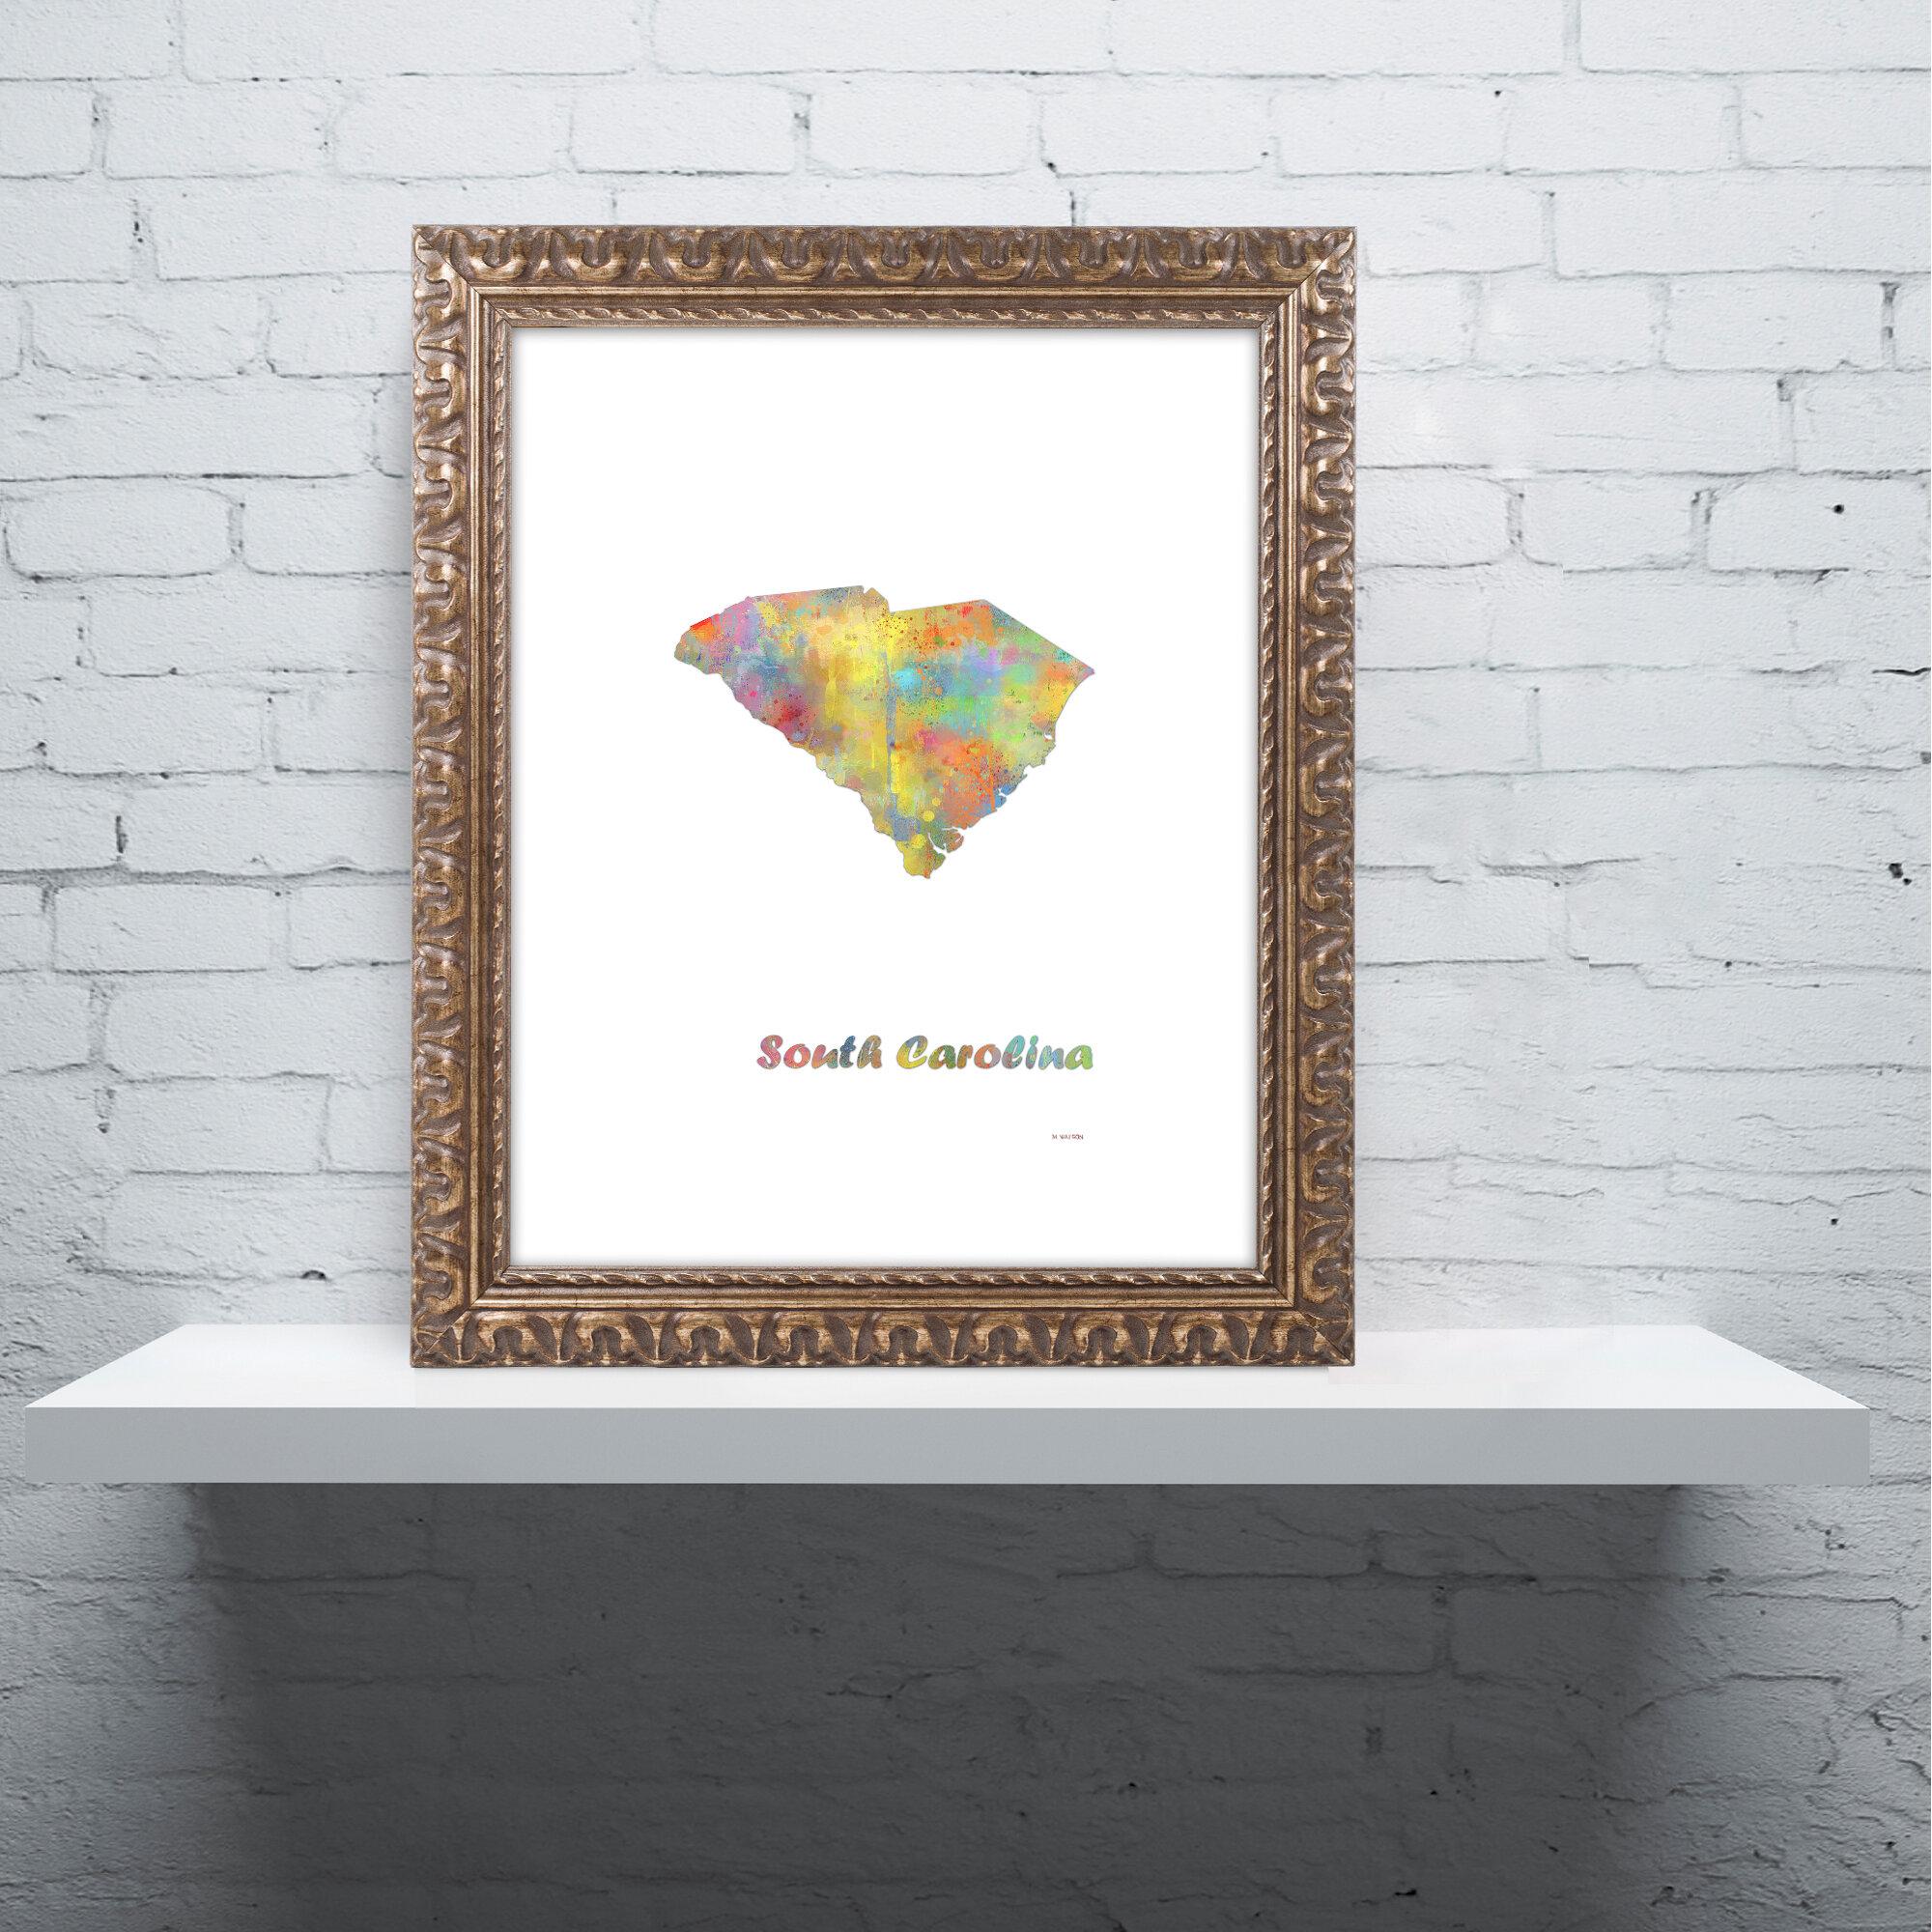 Trademark Art South Carolina State Map 1 Ornate Framed Graphic Art On Canvas Wayfair